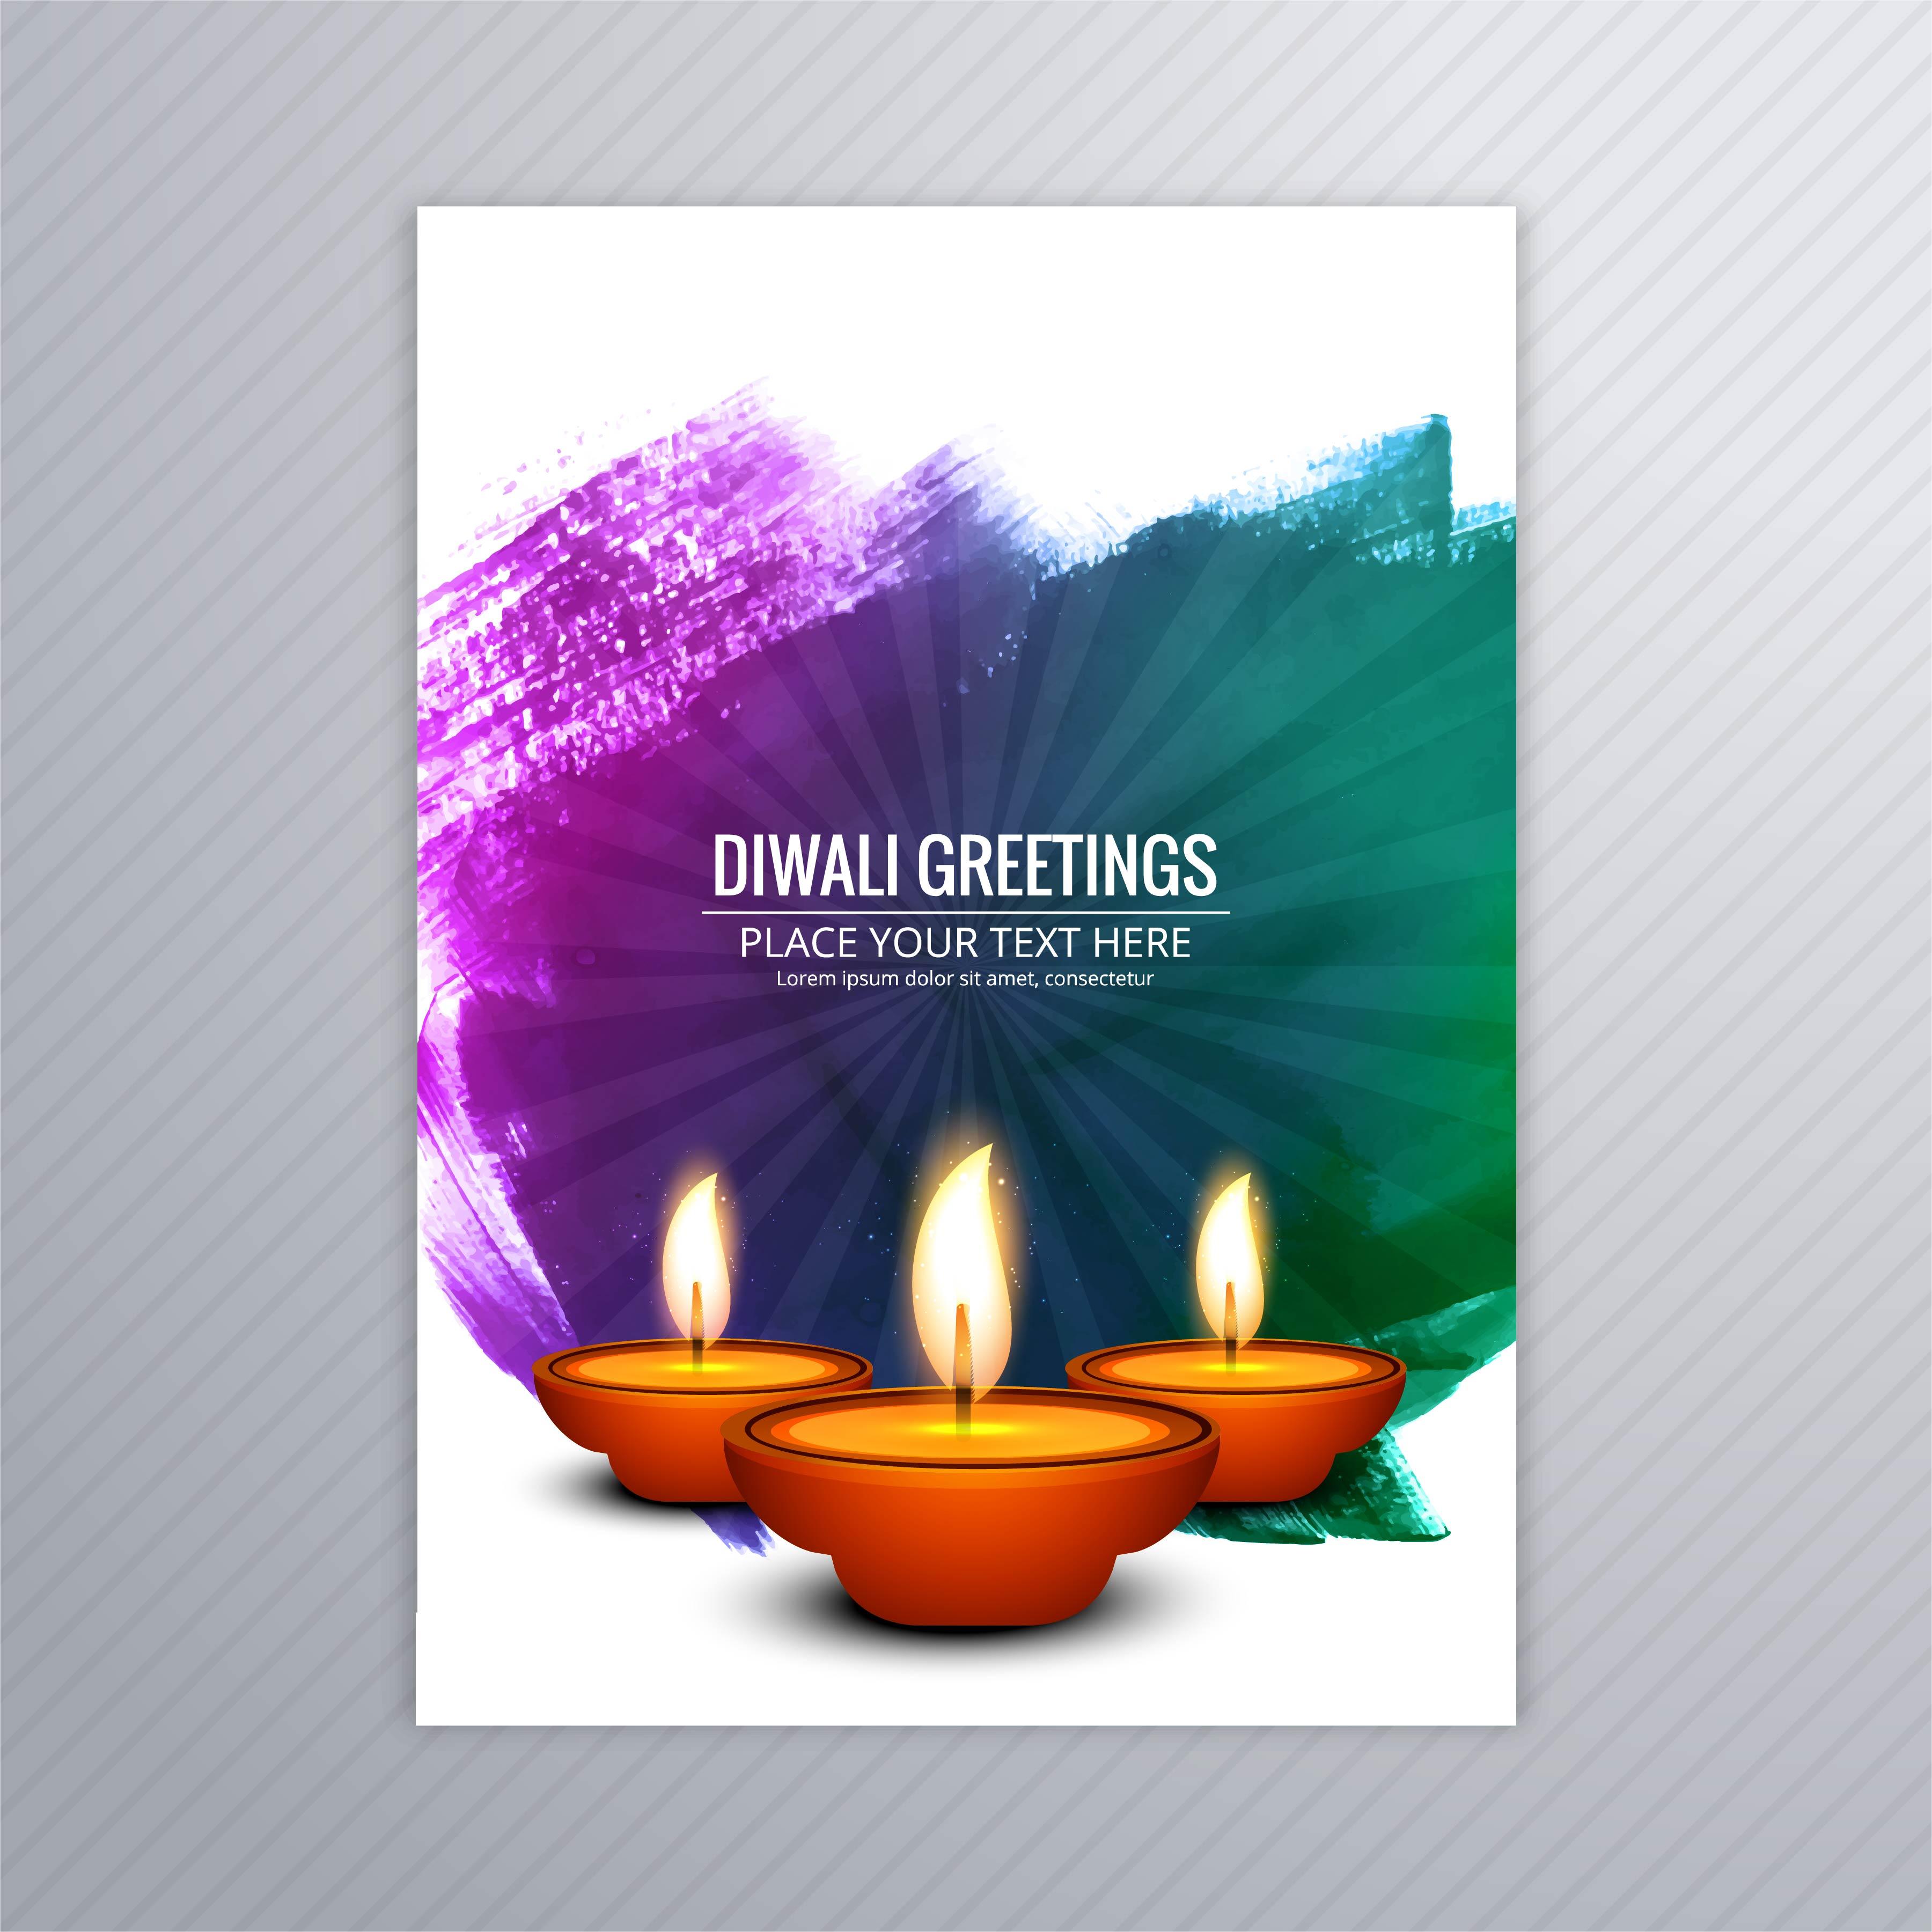 decorative diwali greeting card template design 257976